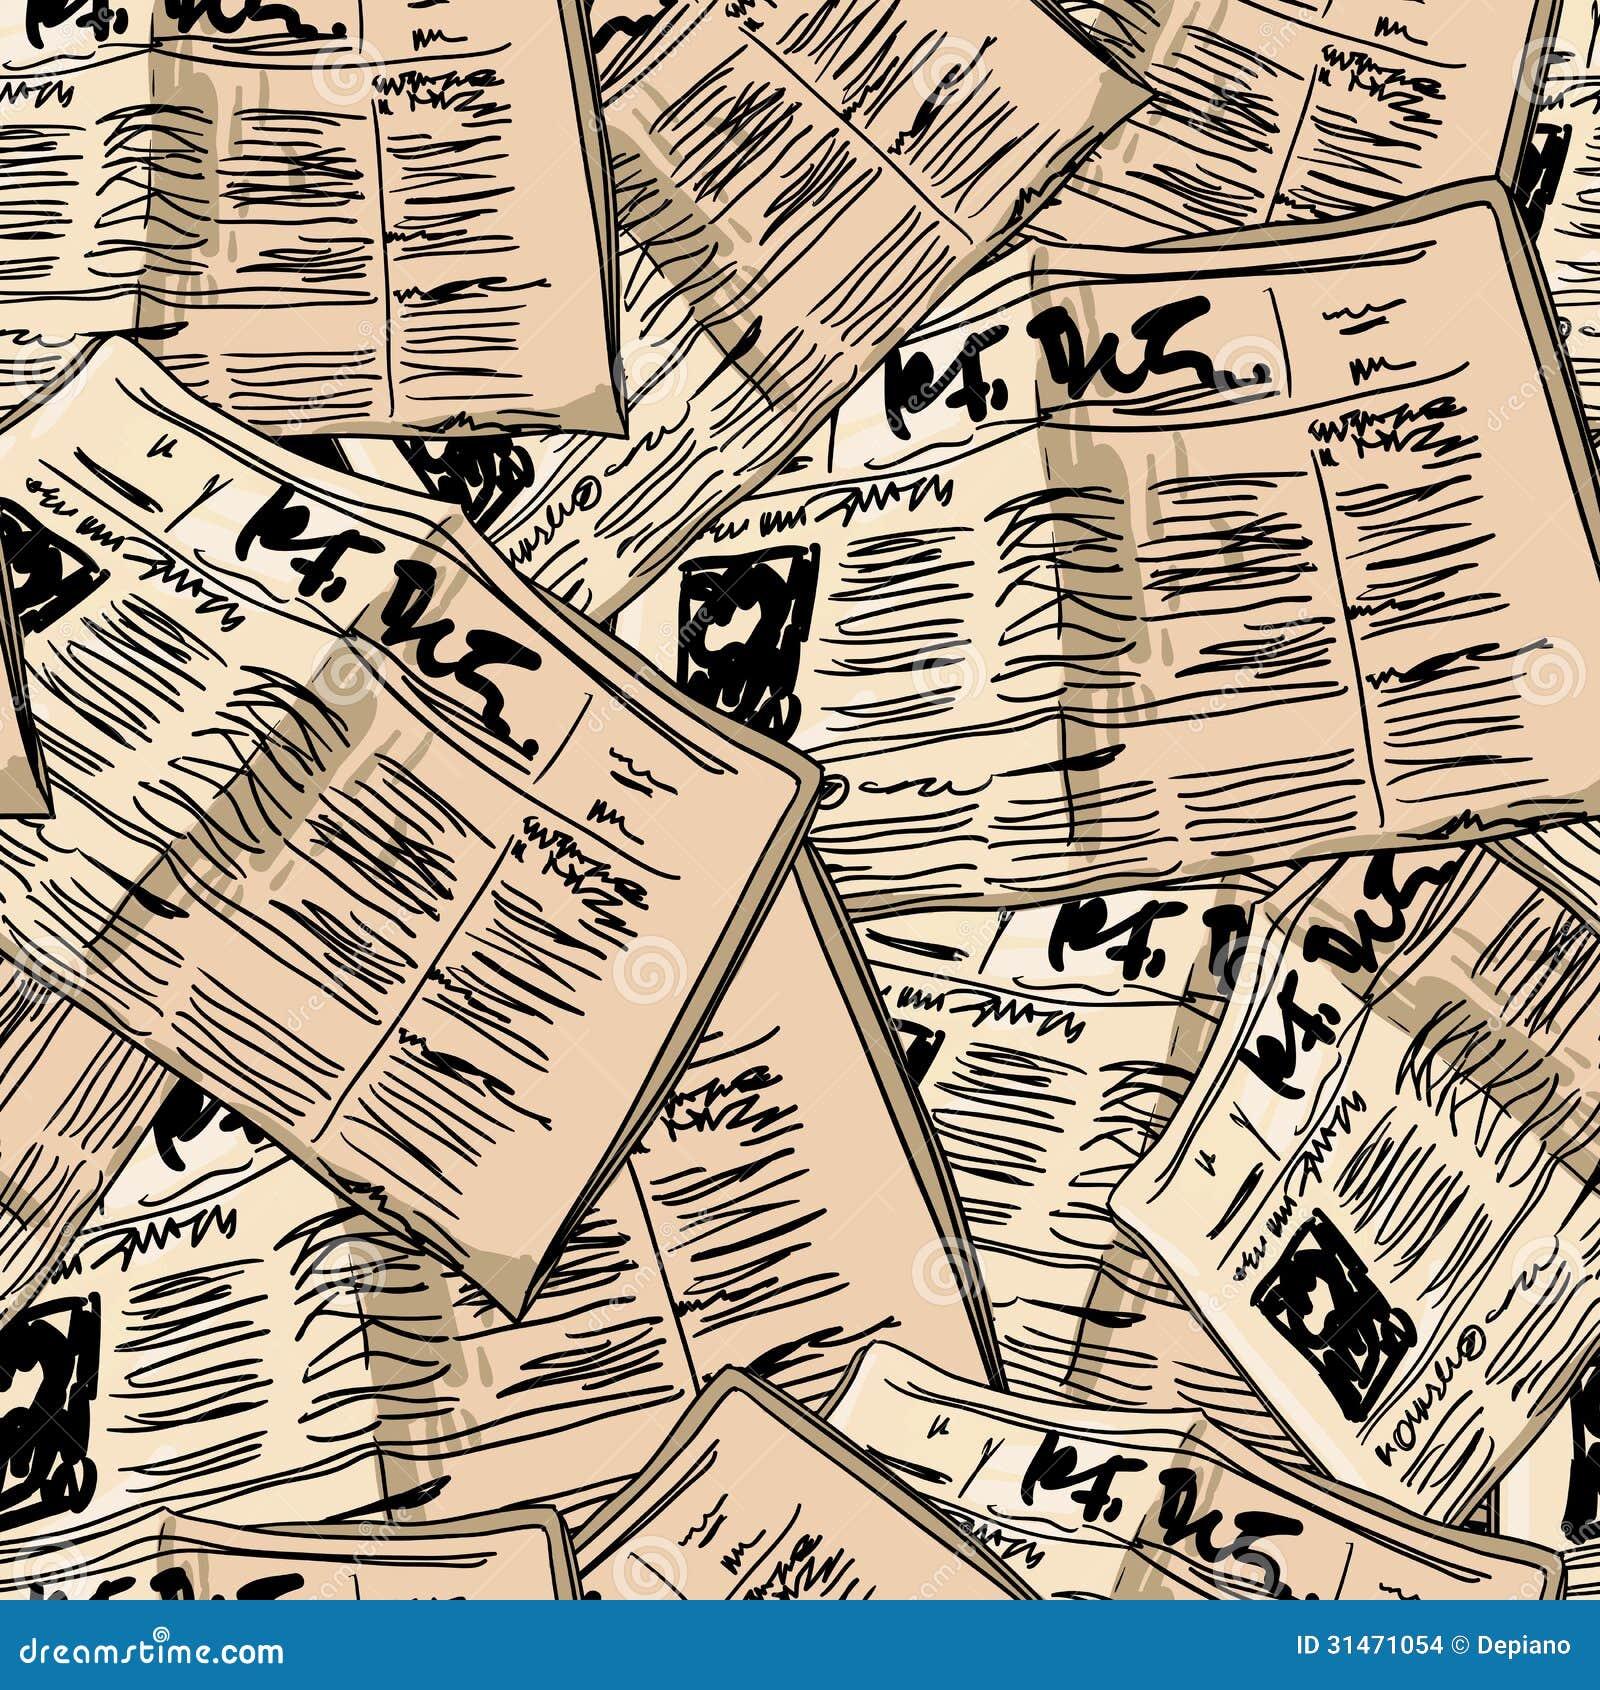 vintage scrapbook backgrounds powerpoint